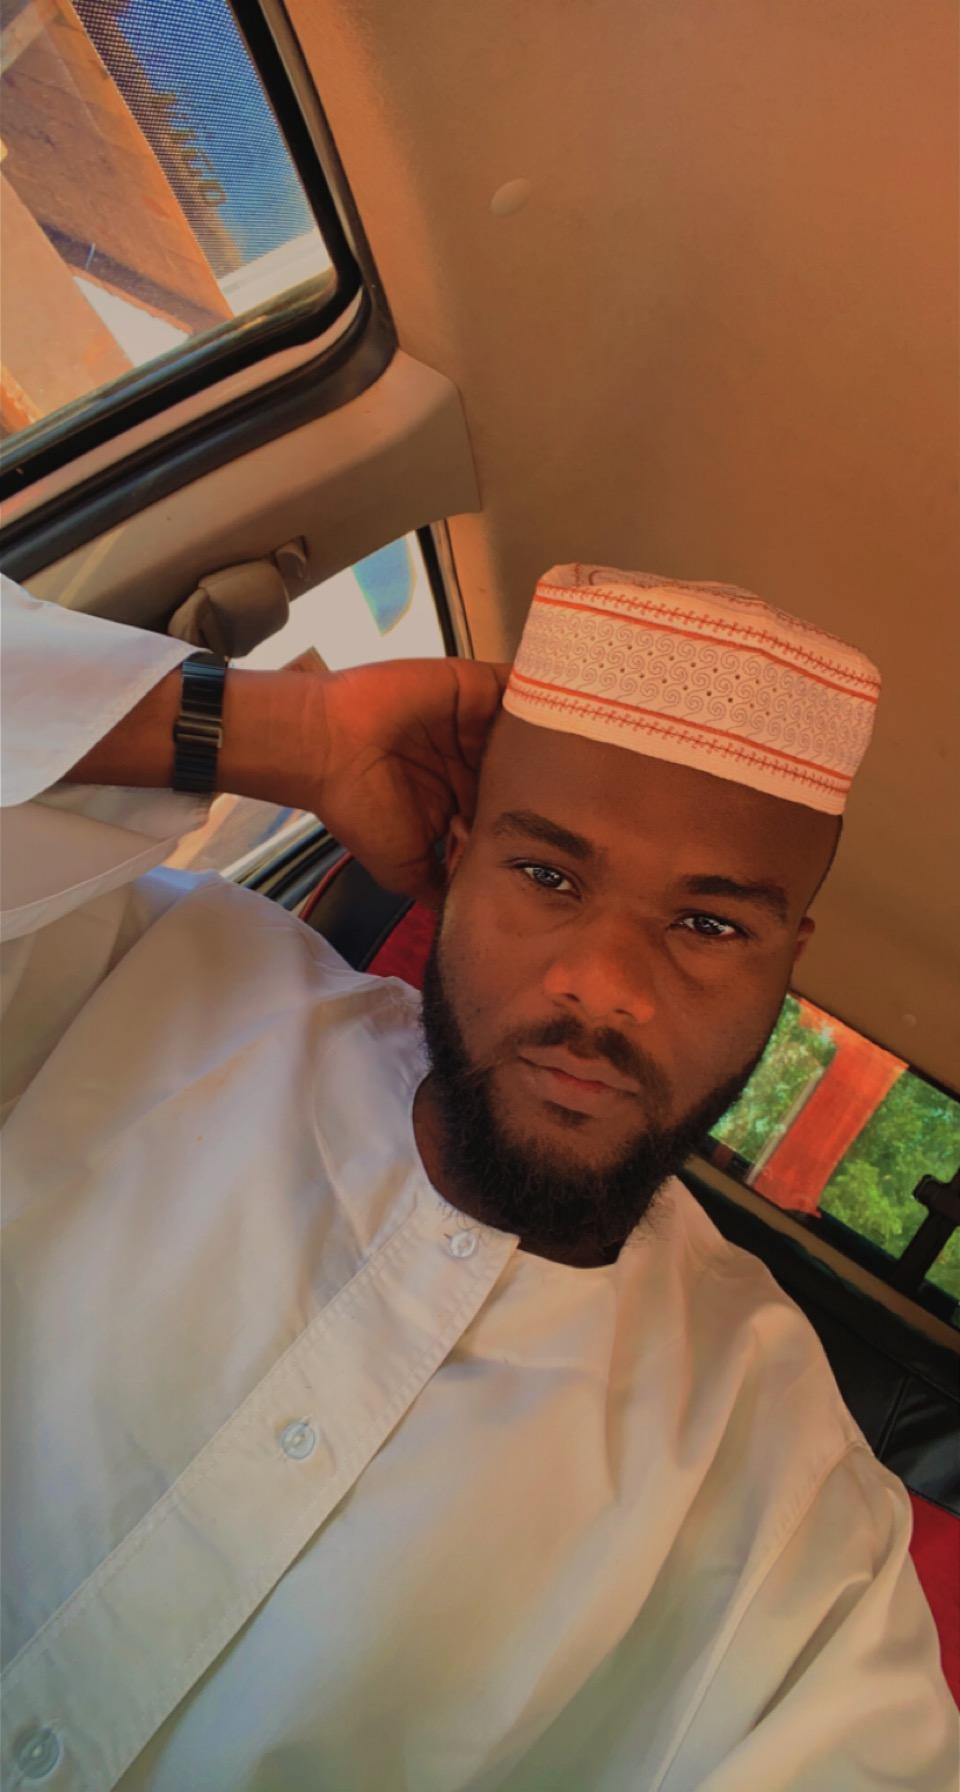 mansourhamoda55 Profile Picture